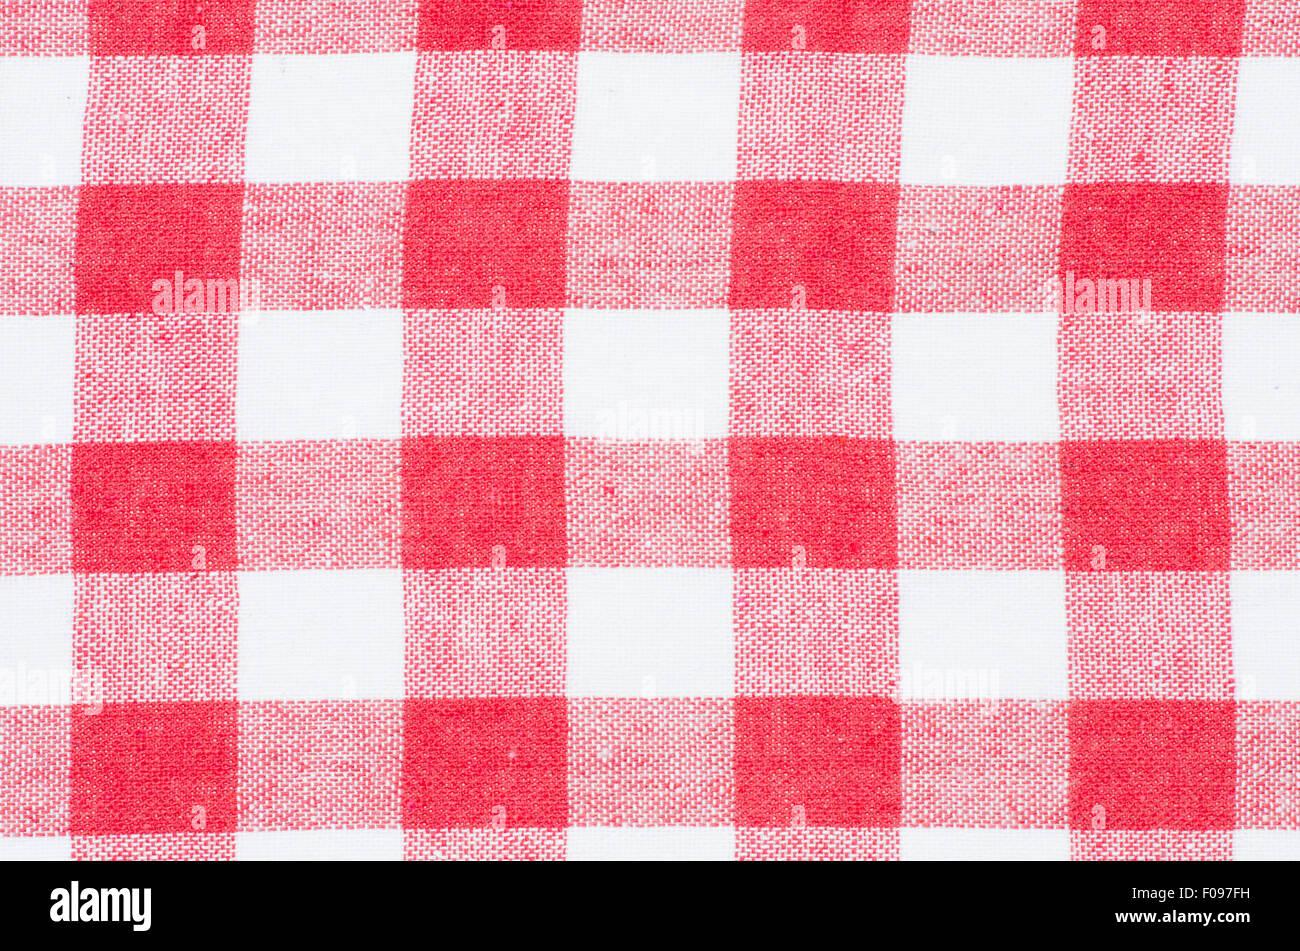 A Quadretti Rossi E Bianchi Asciugamano Da Cucina Texture Di Sfondo